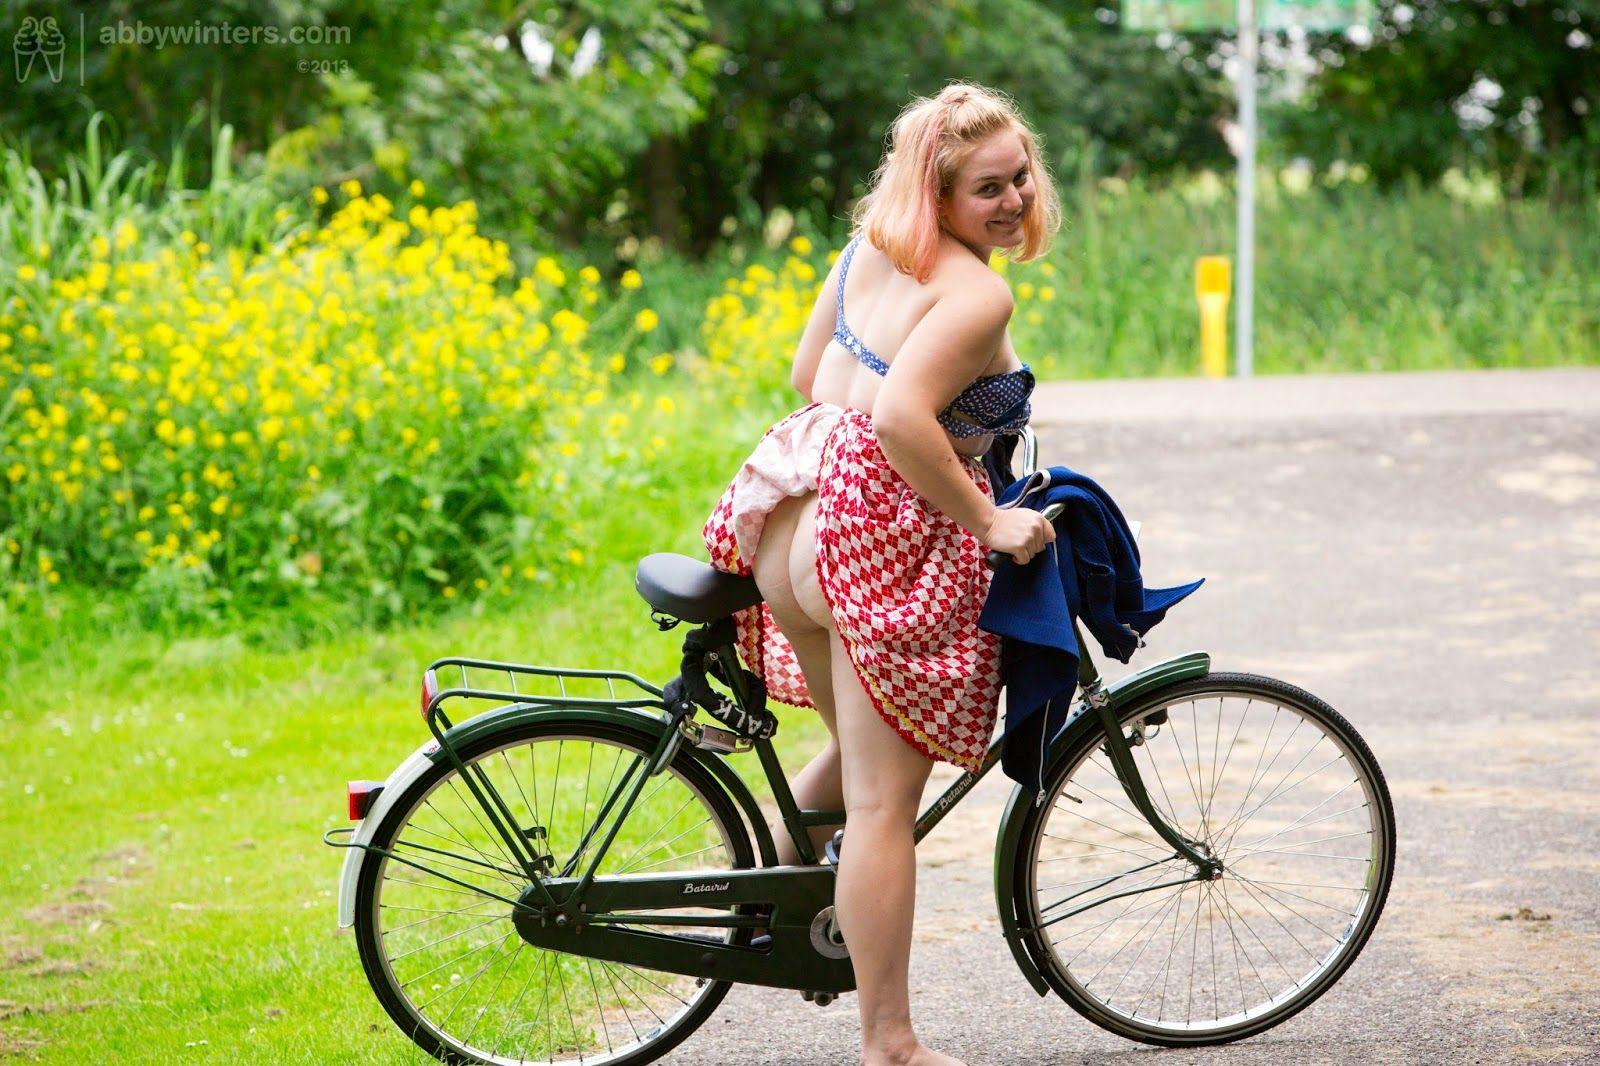 Abby winters bike ride